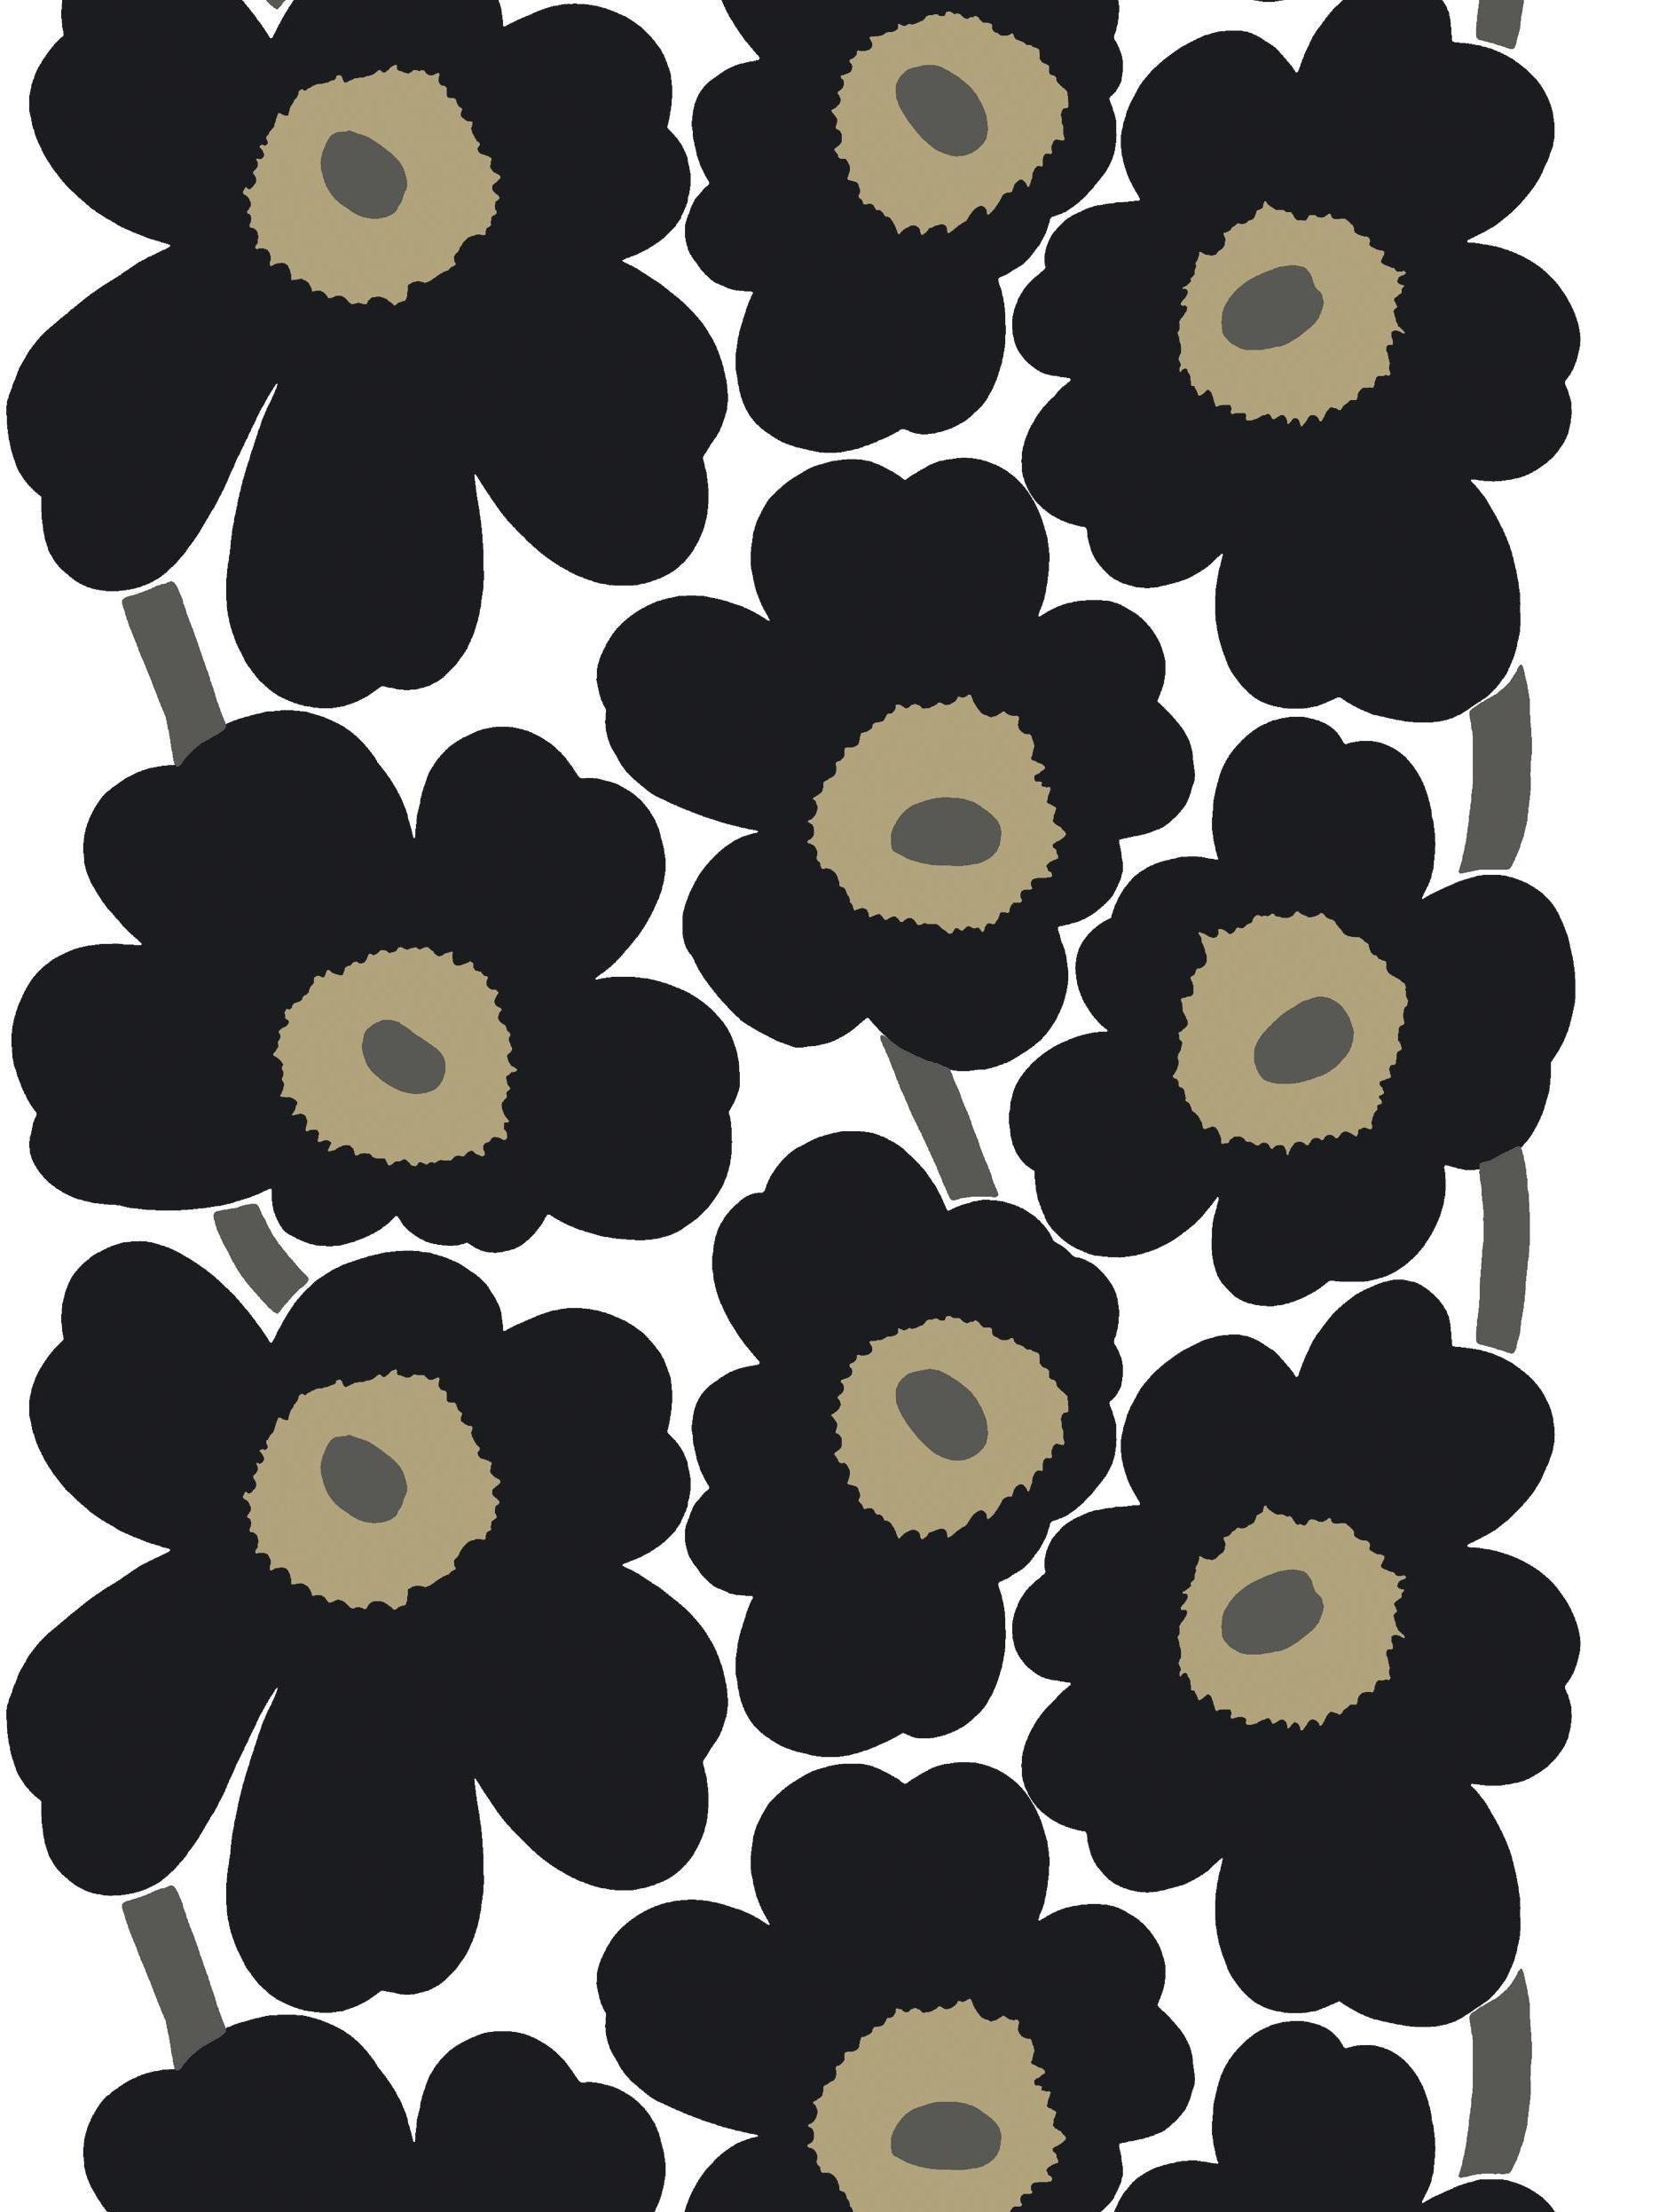 Marimekko fabric unikko unikko black poppy fabric designed